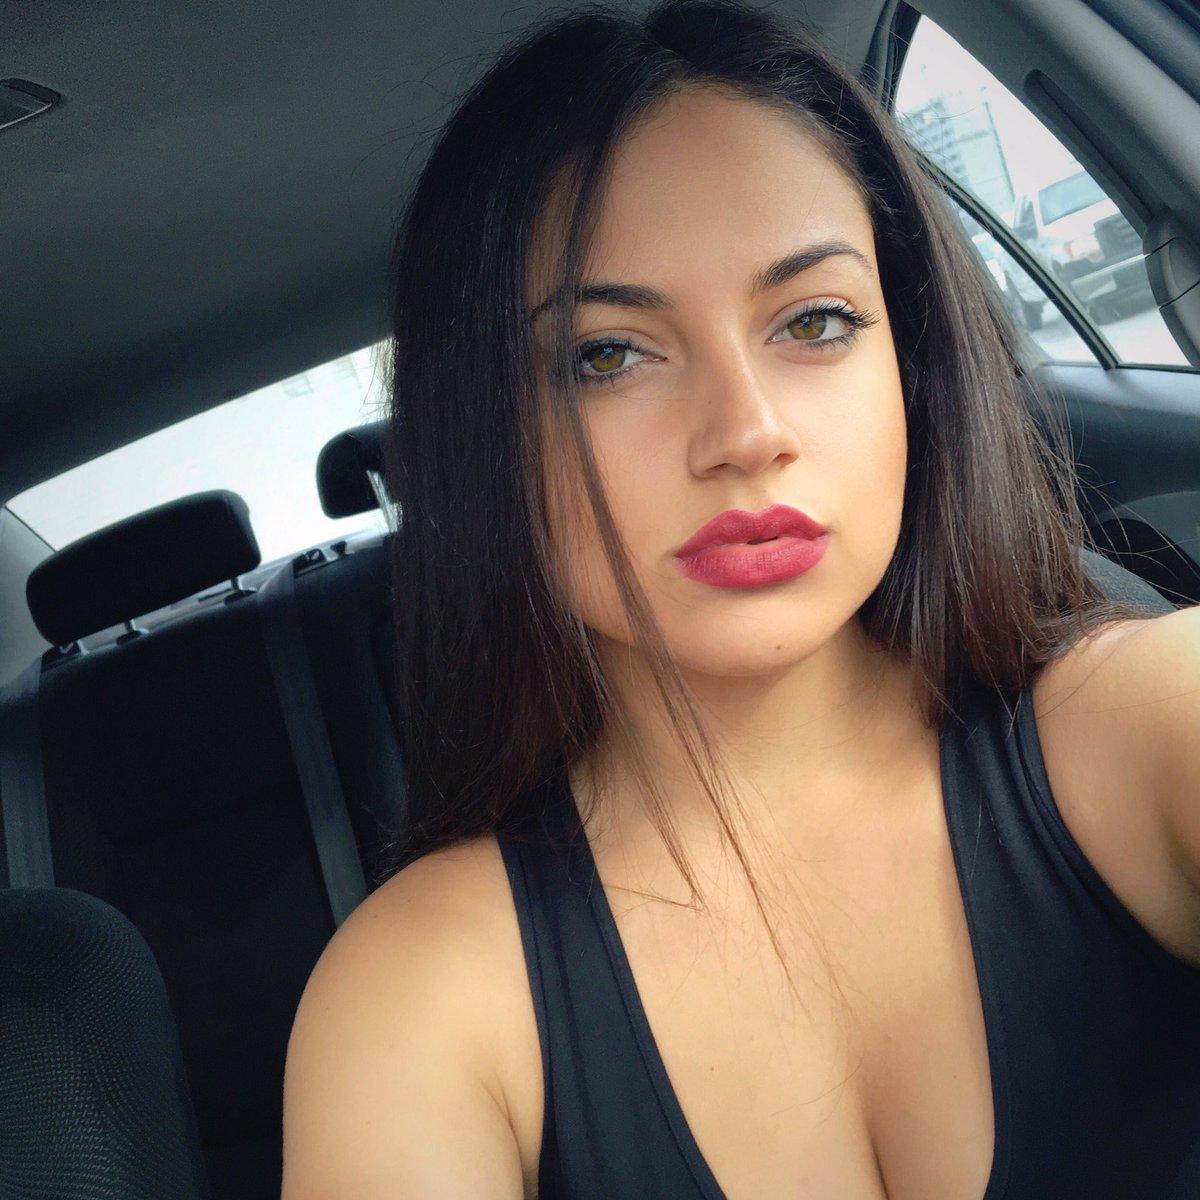 Selfie Inanna Sarkis nude (77 photo), Paparazzi